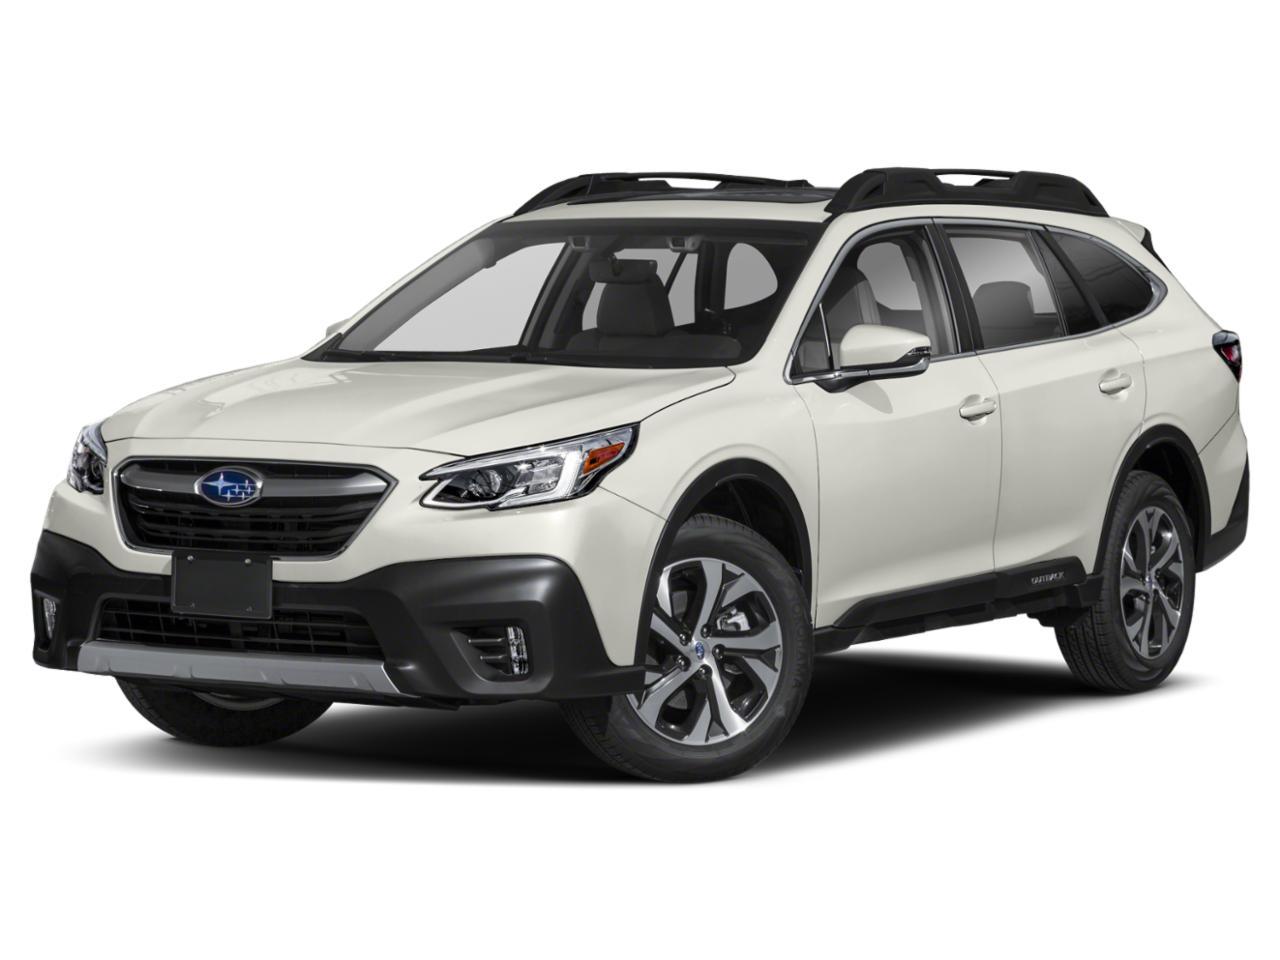 2021 Subaru Outback Vehicle Photo in Green Bay, WI 54304